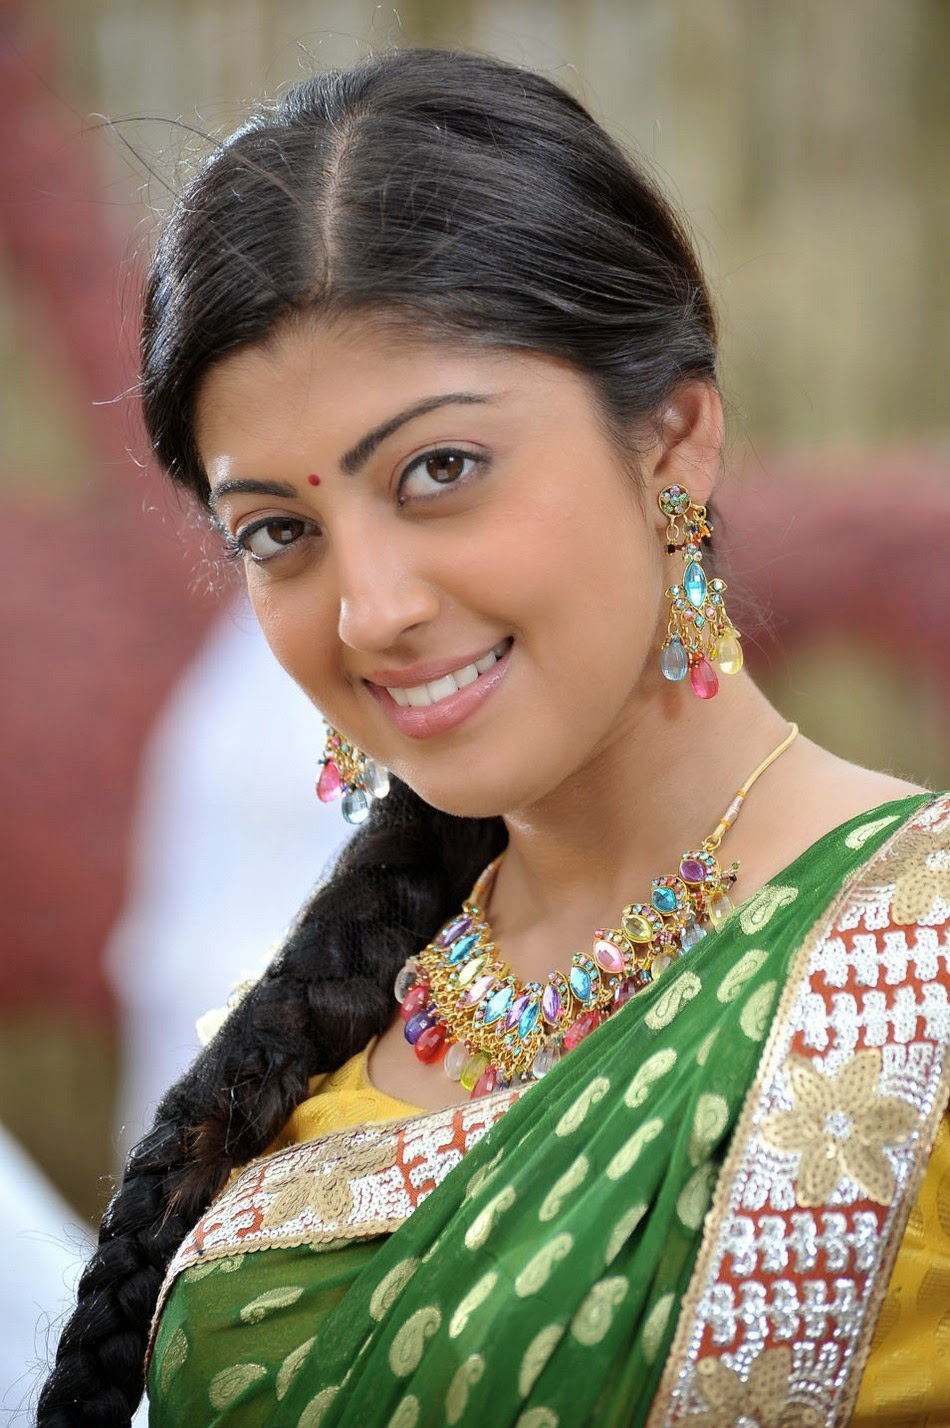 Actress Hd Gallery Pranitha Subhash Latest Cute Saree Hot -6165